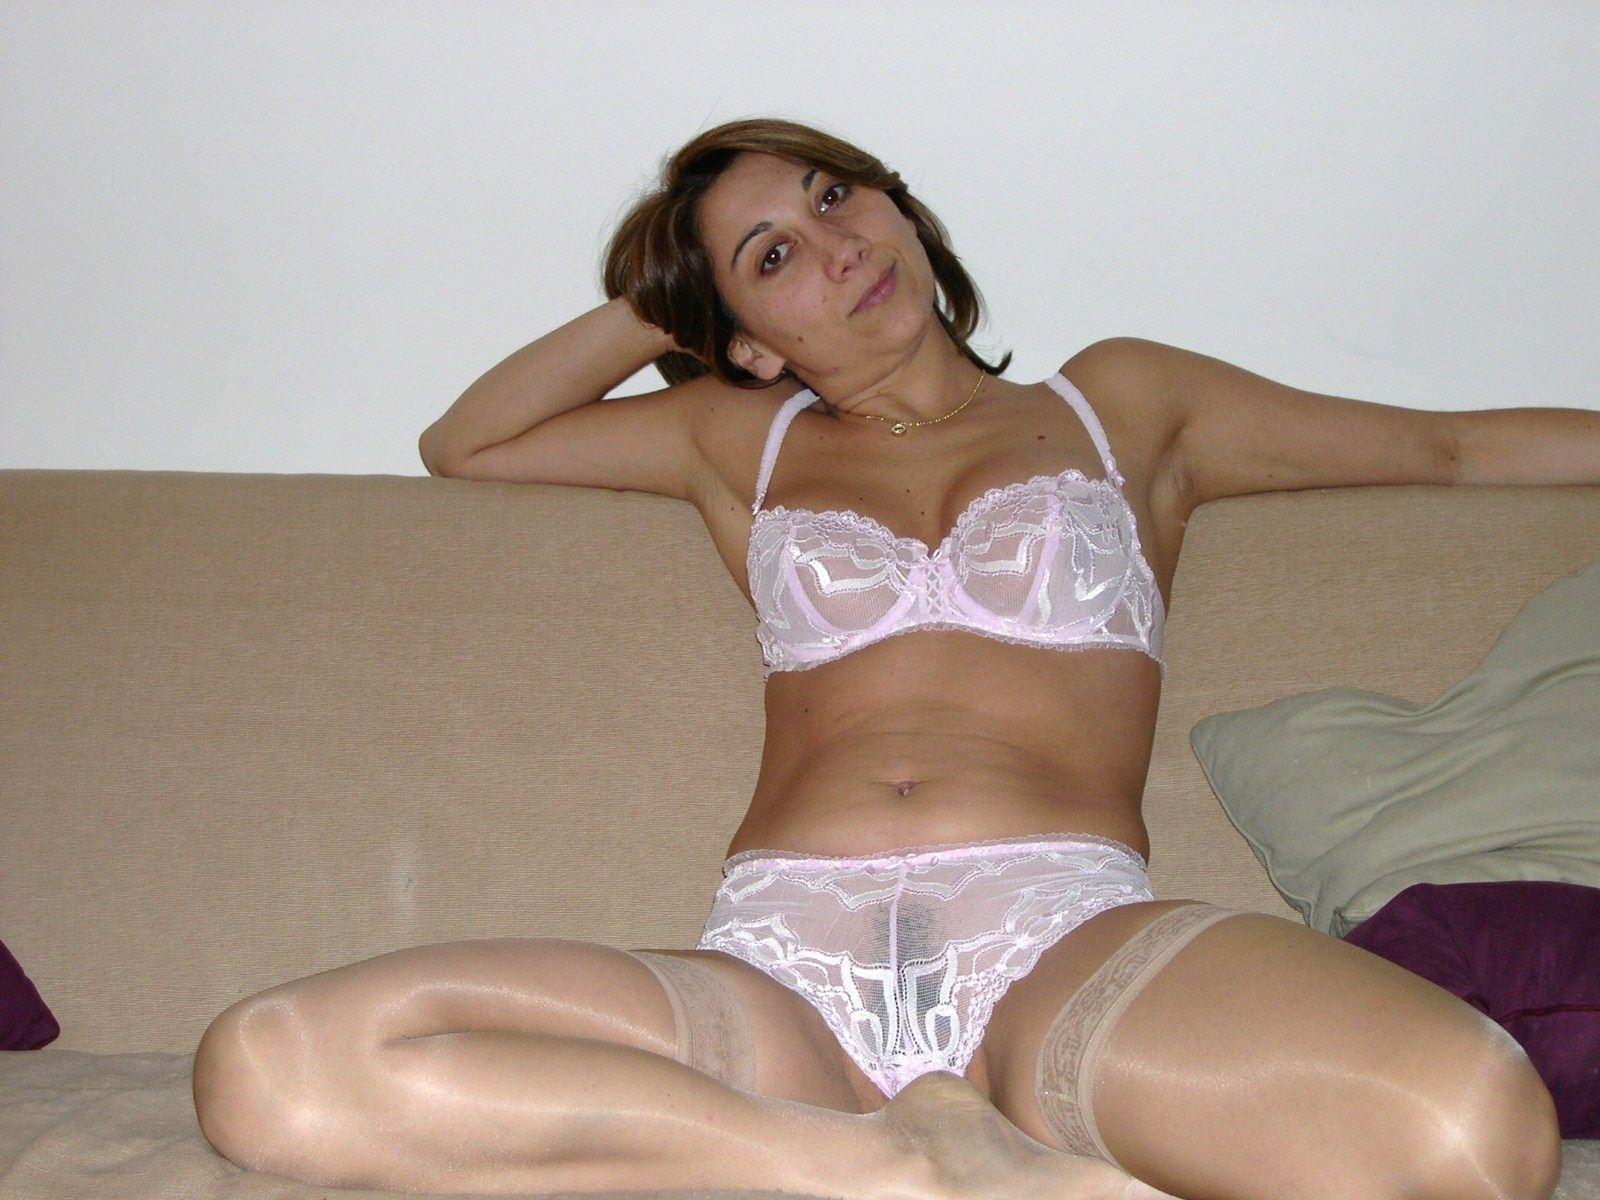 natalie portman hot naked vagina